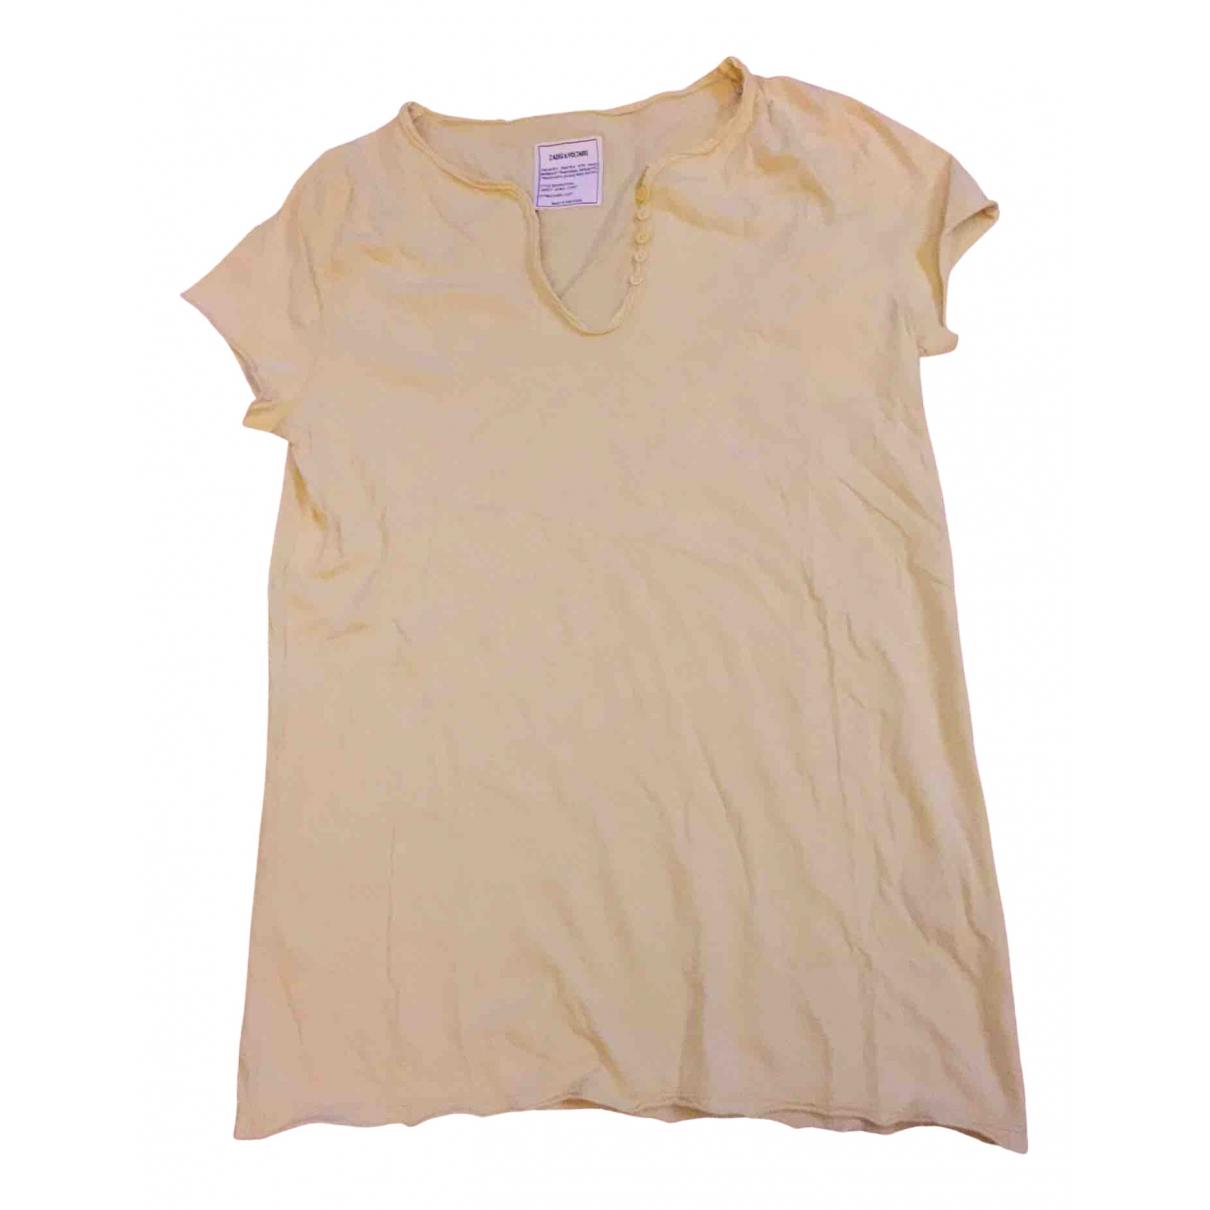 Zadig & Voltaire \N Yellow Cotton  top for Women S International